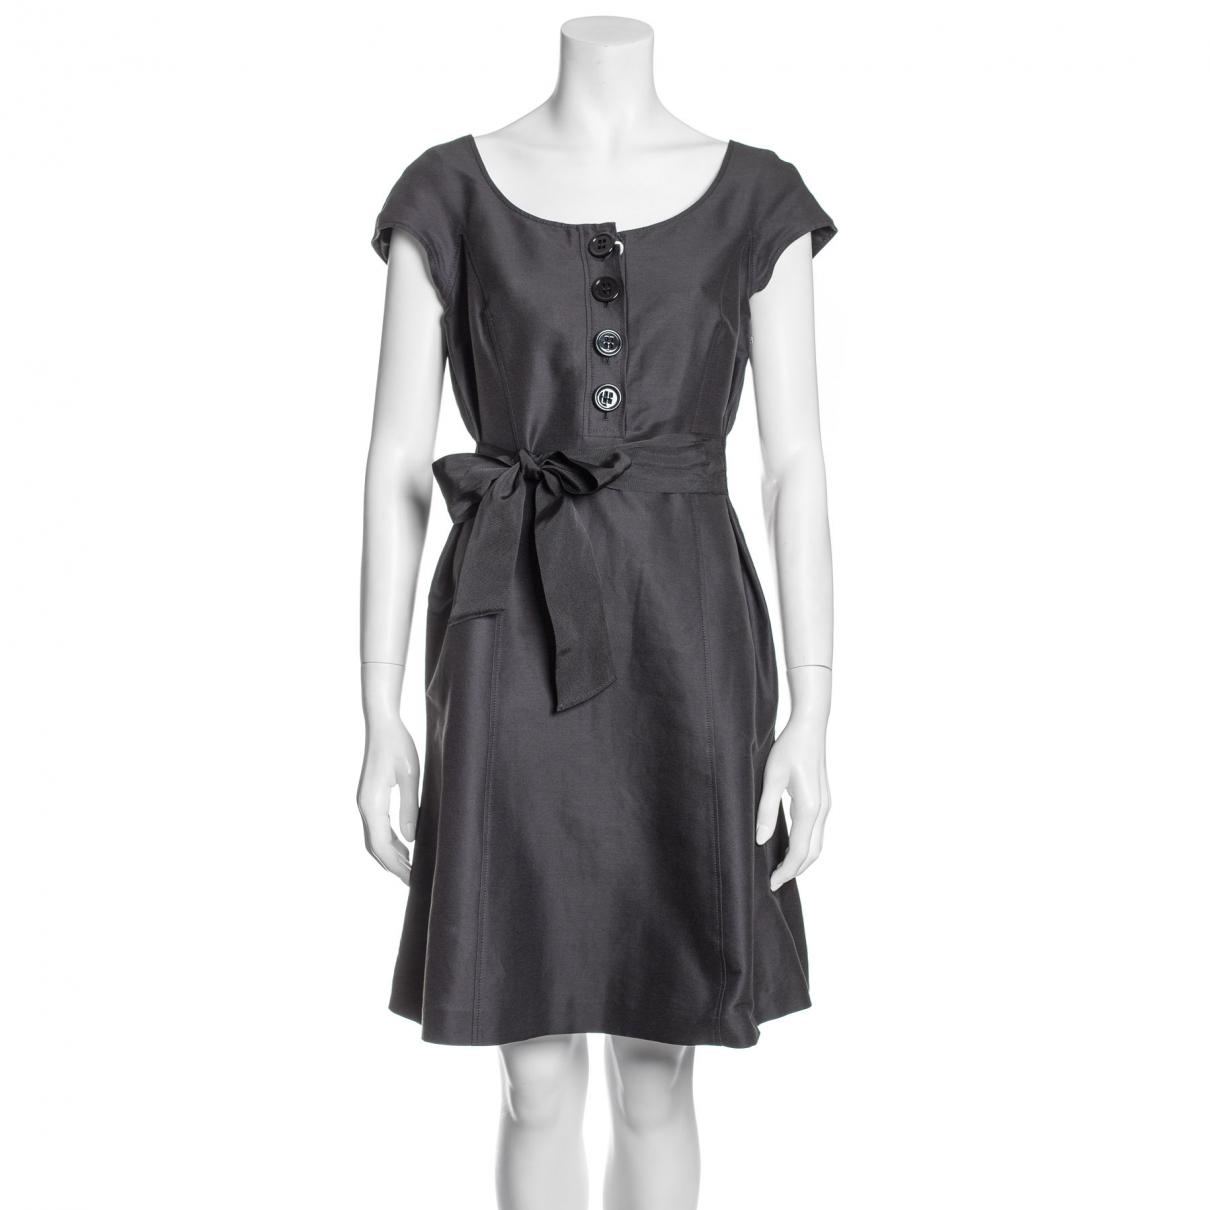 Moschino \N Black Cotton dress for Women 42 IT